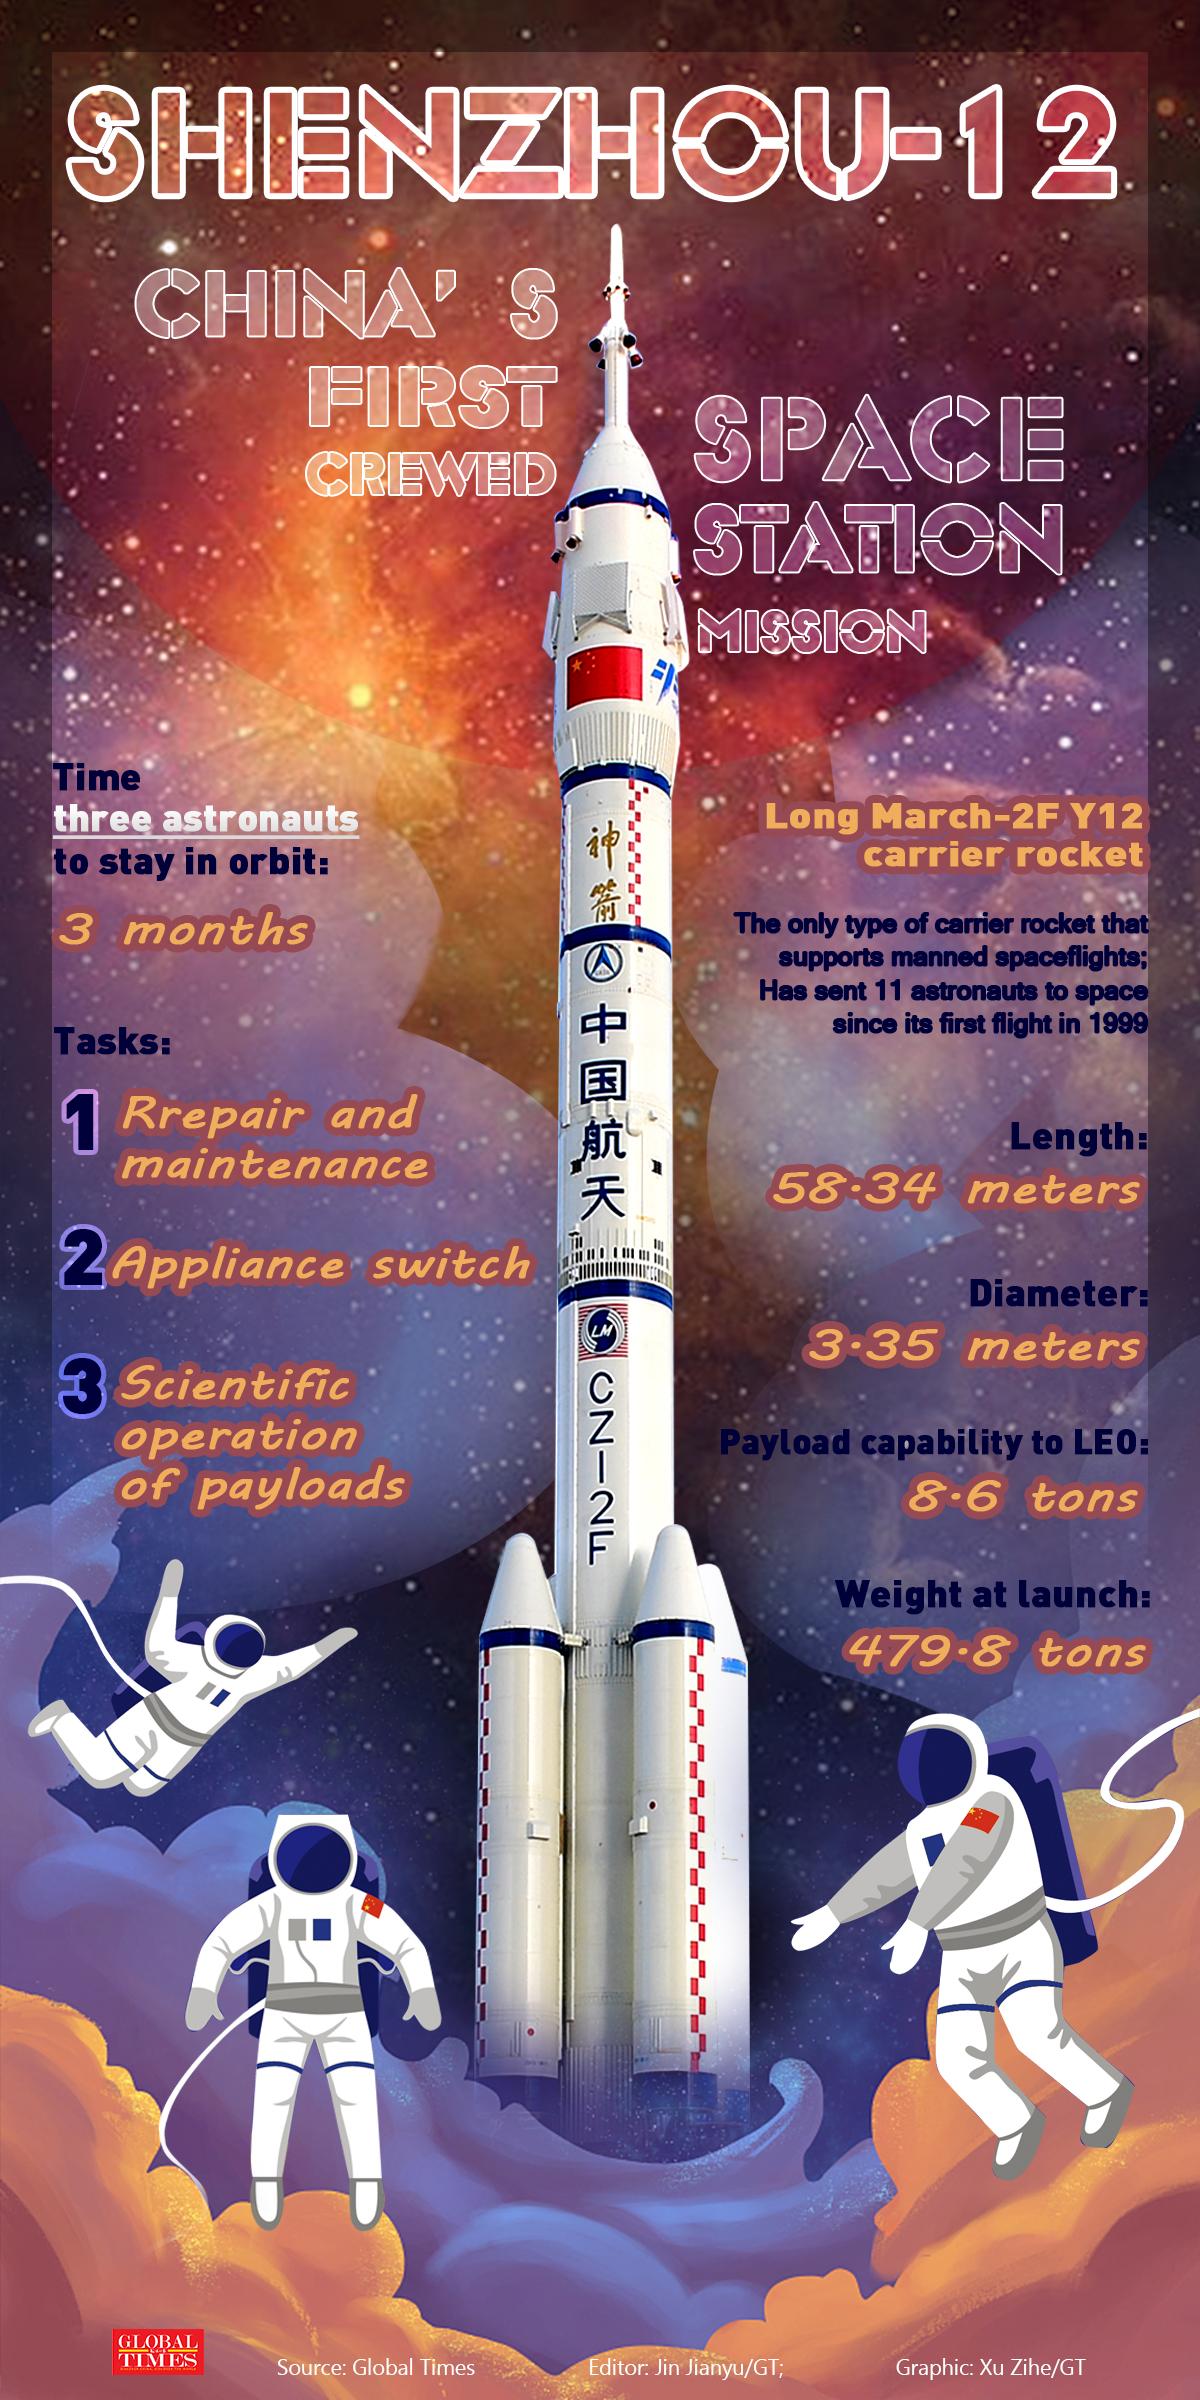 Shenzhou-12, China's first crewed space station mission, explained Graphic: Jin Jianyu, Xu Zihe/GT